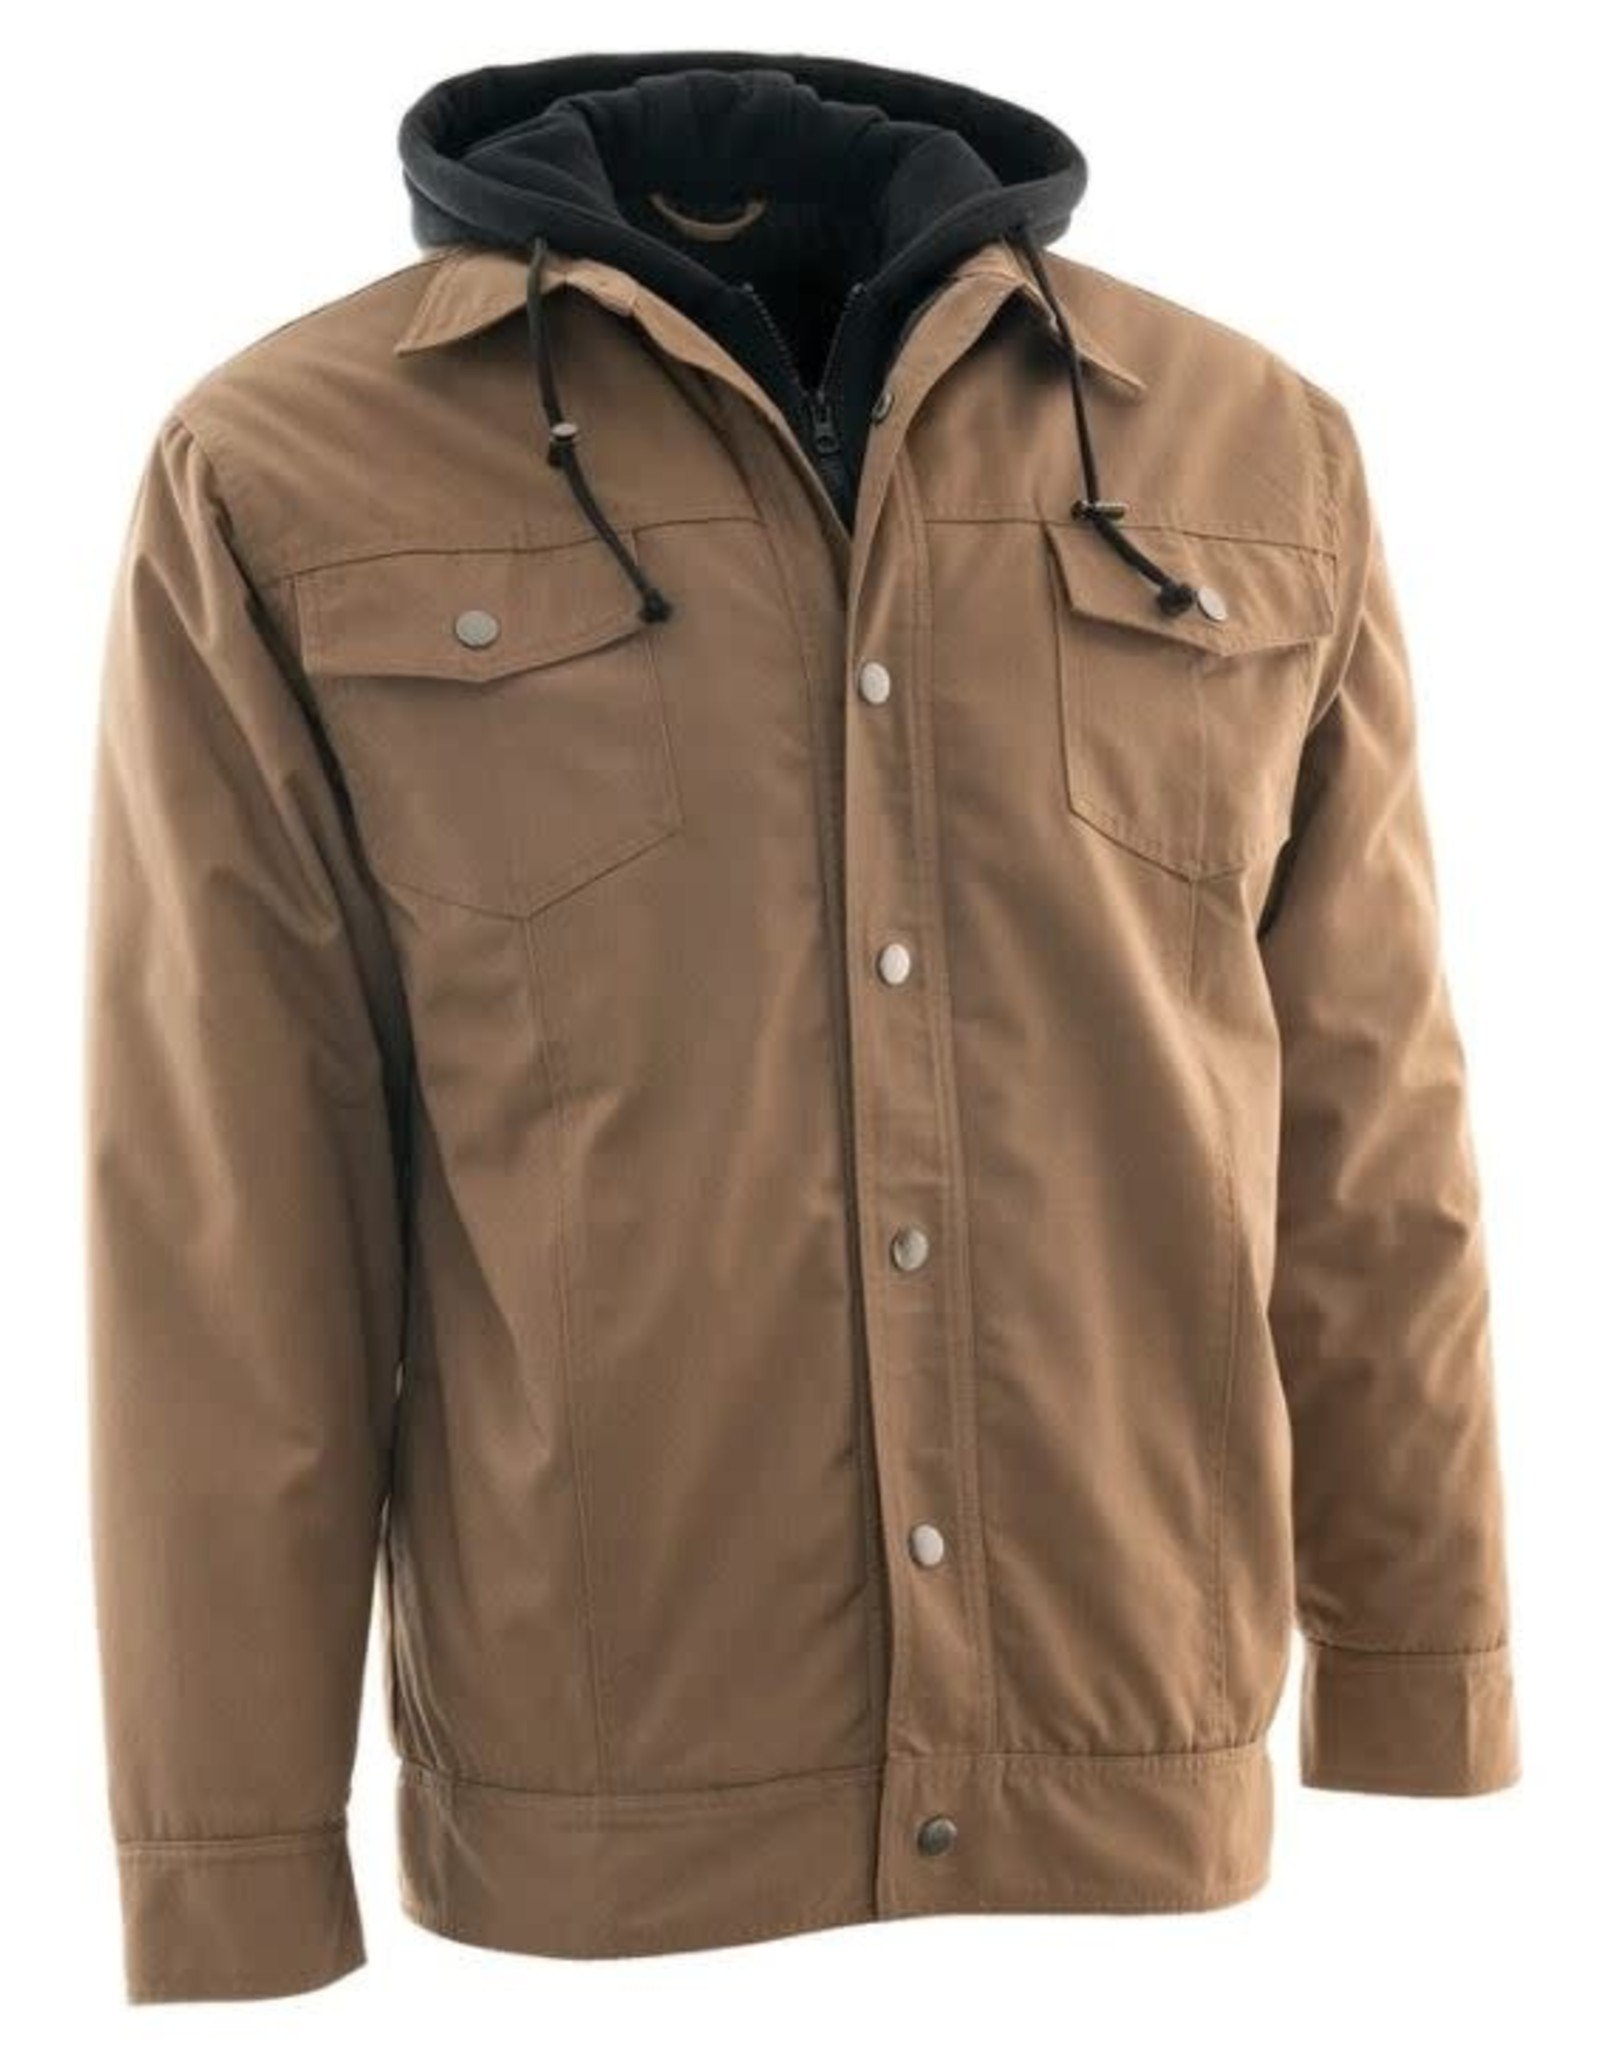 Forcefield Cotton/Canvas Work Jacket w/Hoodie